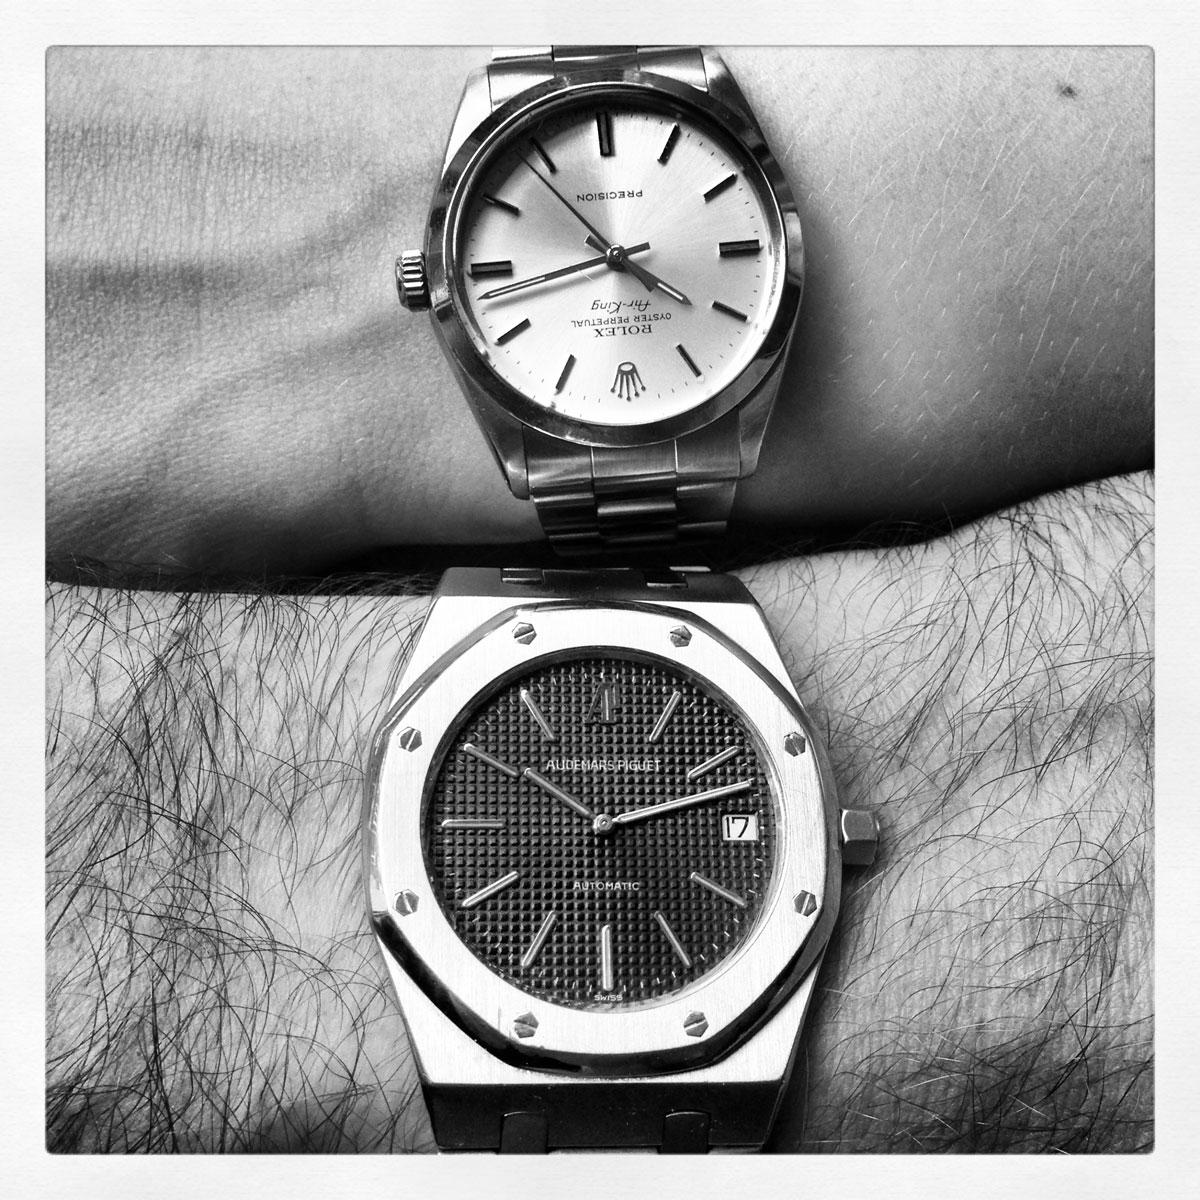 His & Hers - AP Royak & Rolex Airking